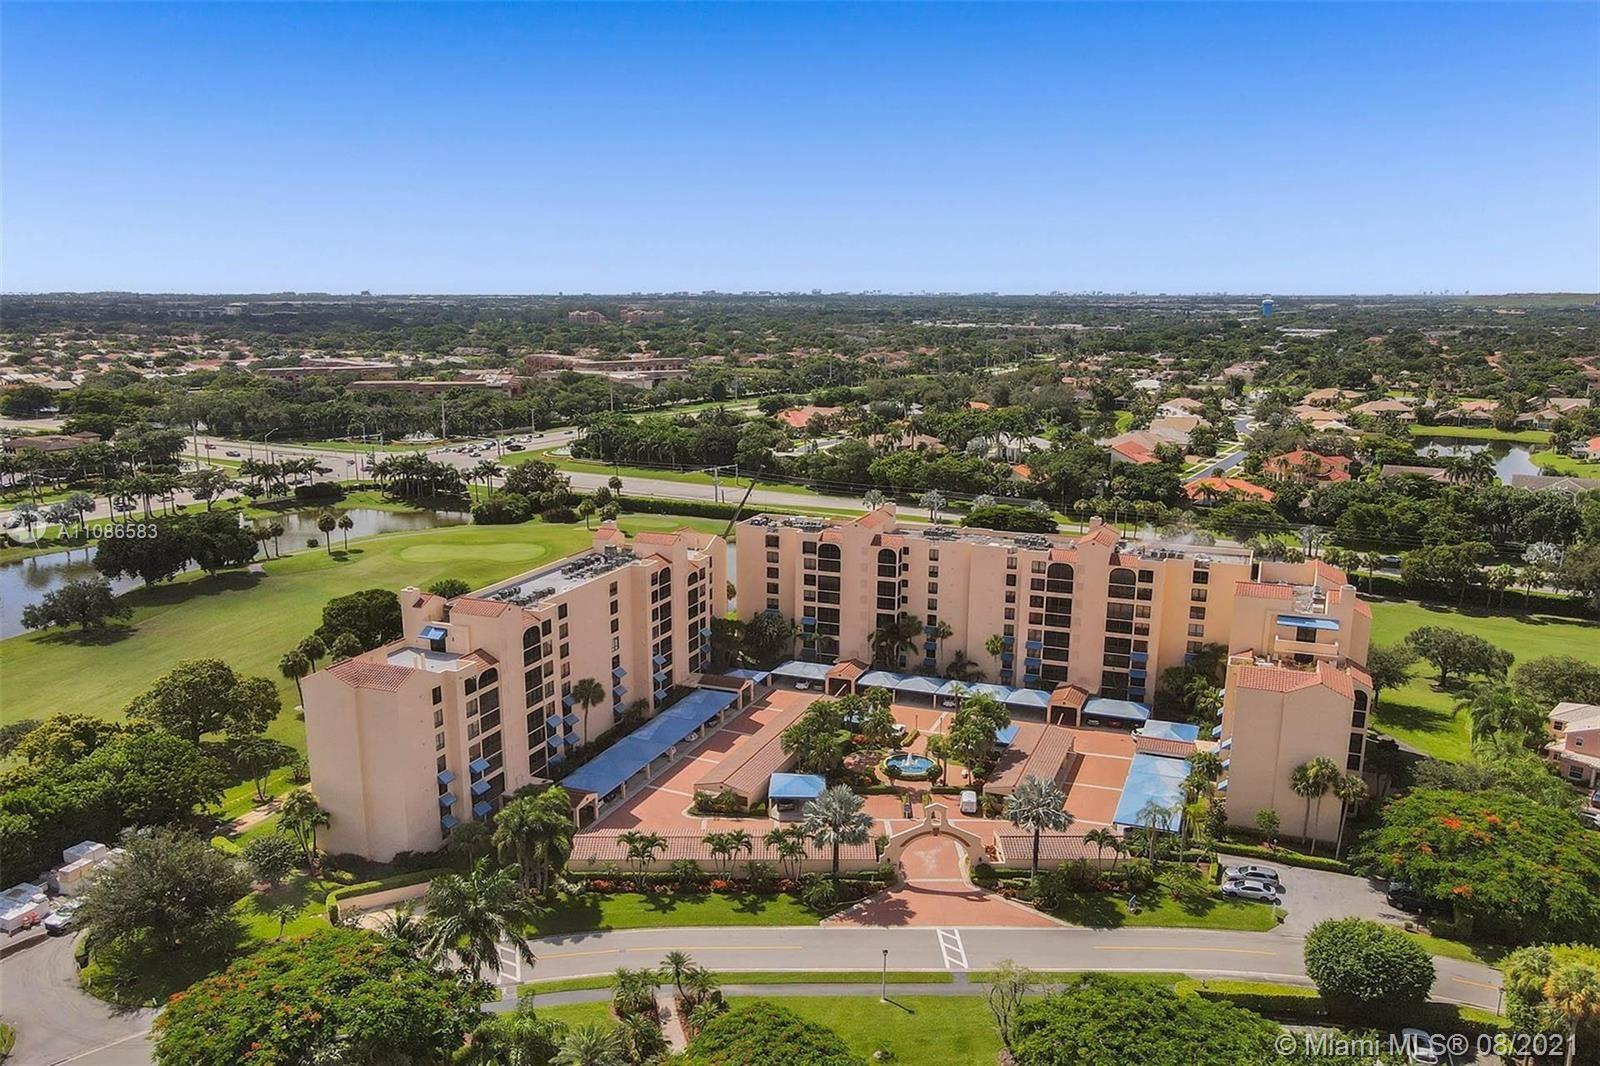 7194 Promenade Dr #101, Boca Raton, FL 33433 - #: A11086583